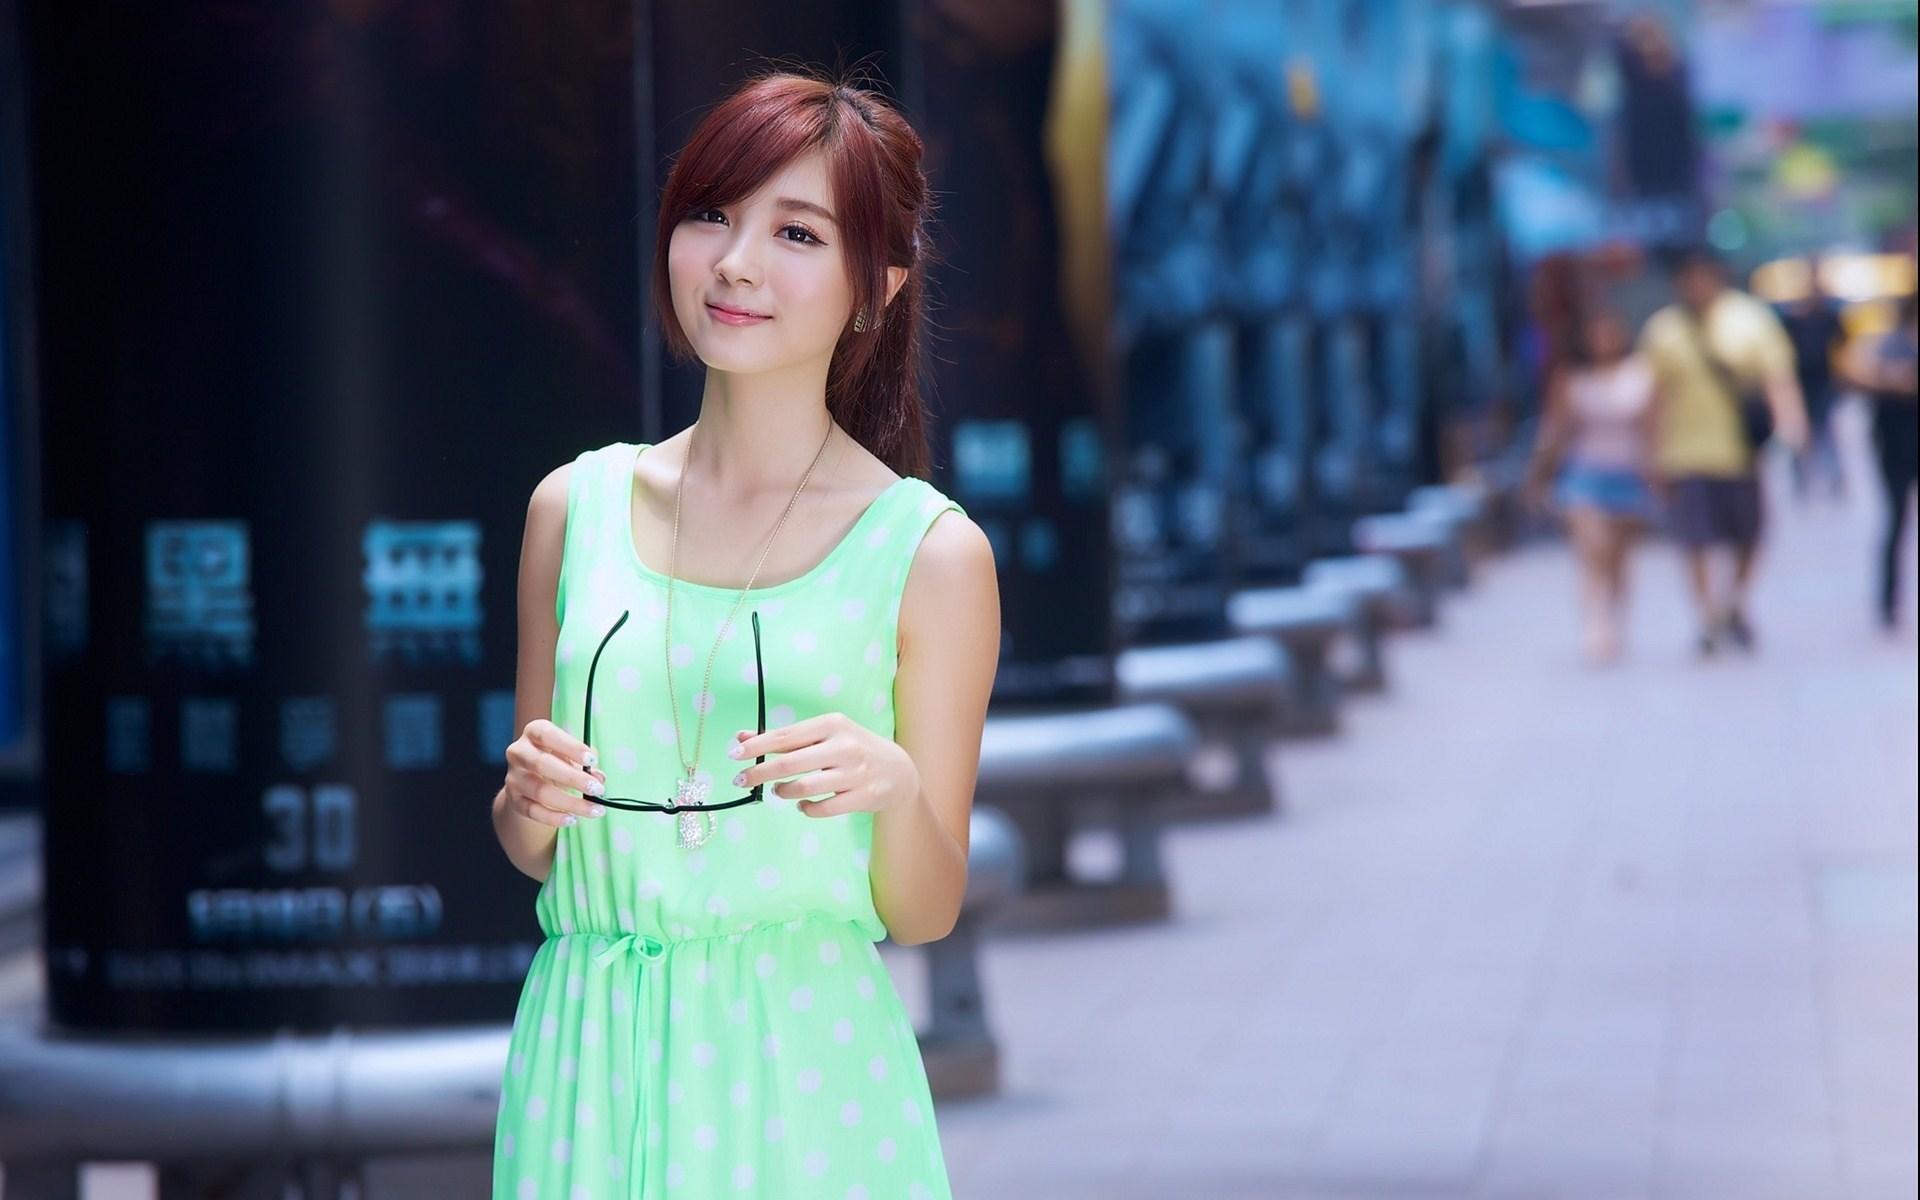 Patty Yong Backgrounds, Compatible - PC, Mobile, Gadgets  1920x1200 px